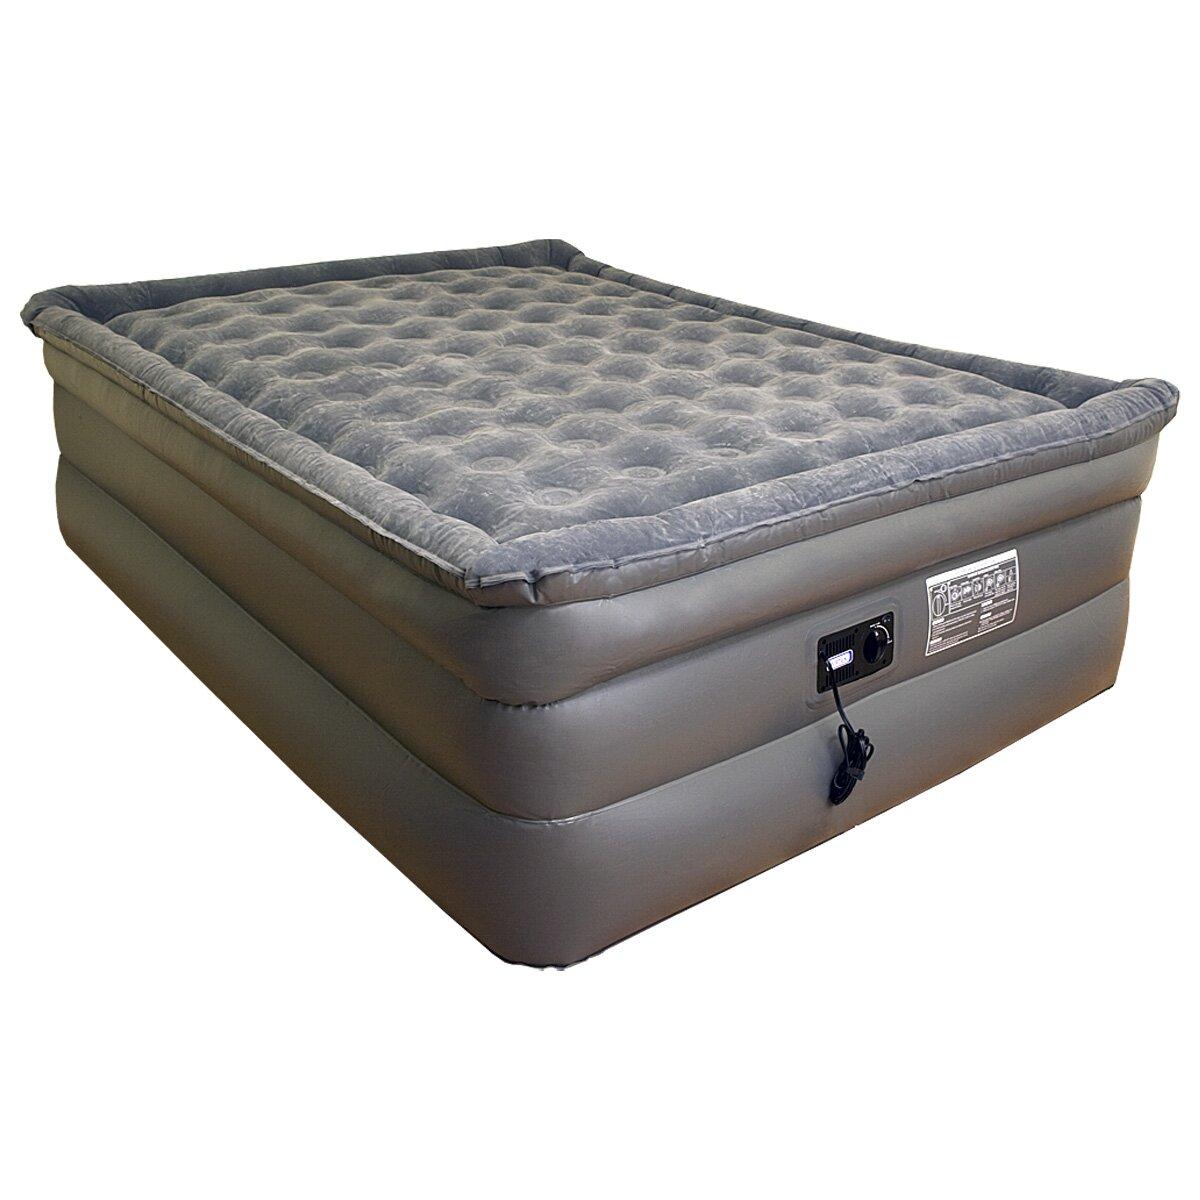 Slumberland Bedroom Furniture Airtek Slumberland Deluxe Comfort 26 Raised Pillowtop Air